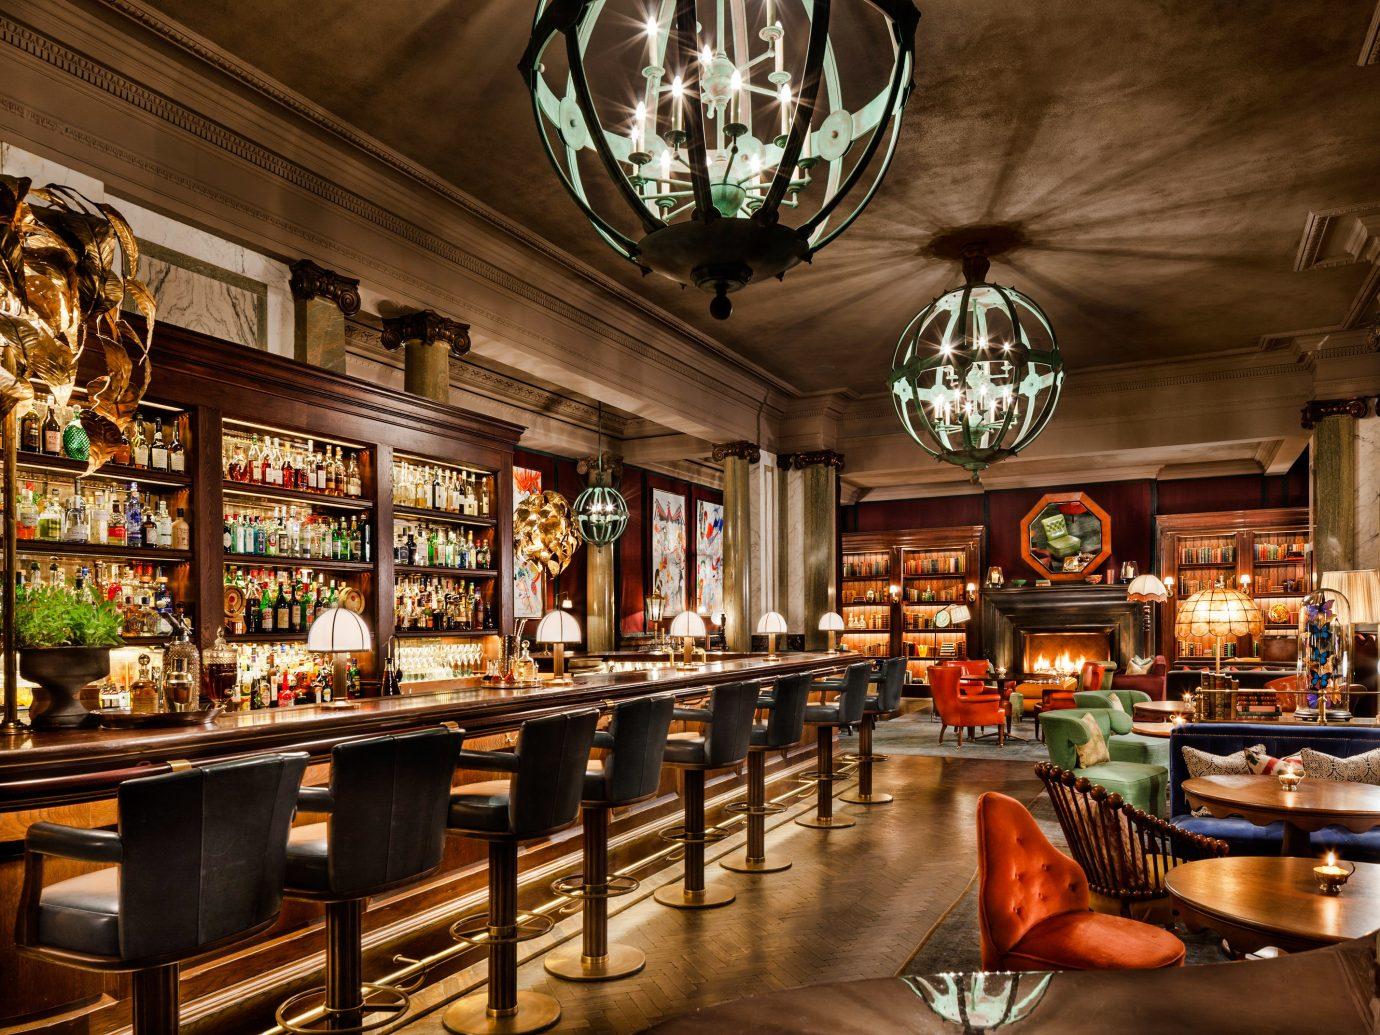 Food + Drink Trip Ideas indoor ceiling Bar interior design store restaurant pub tavern several